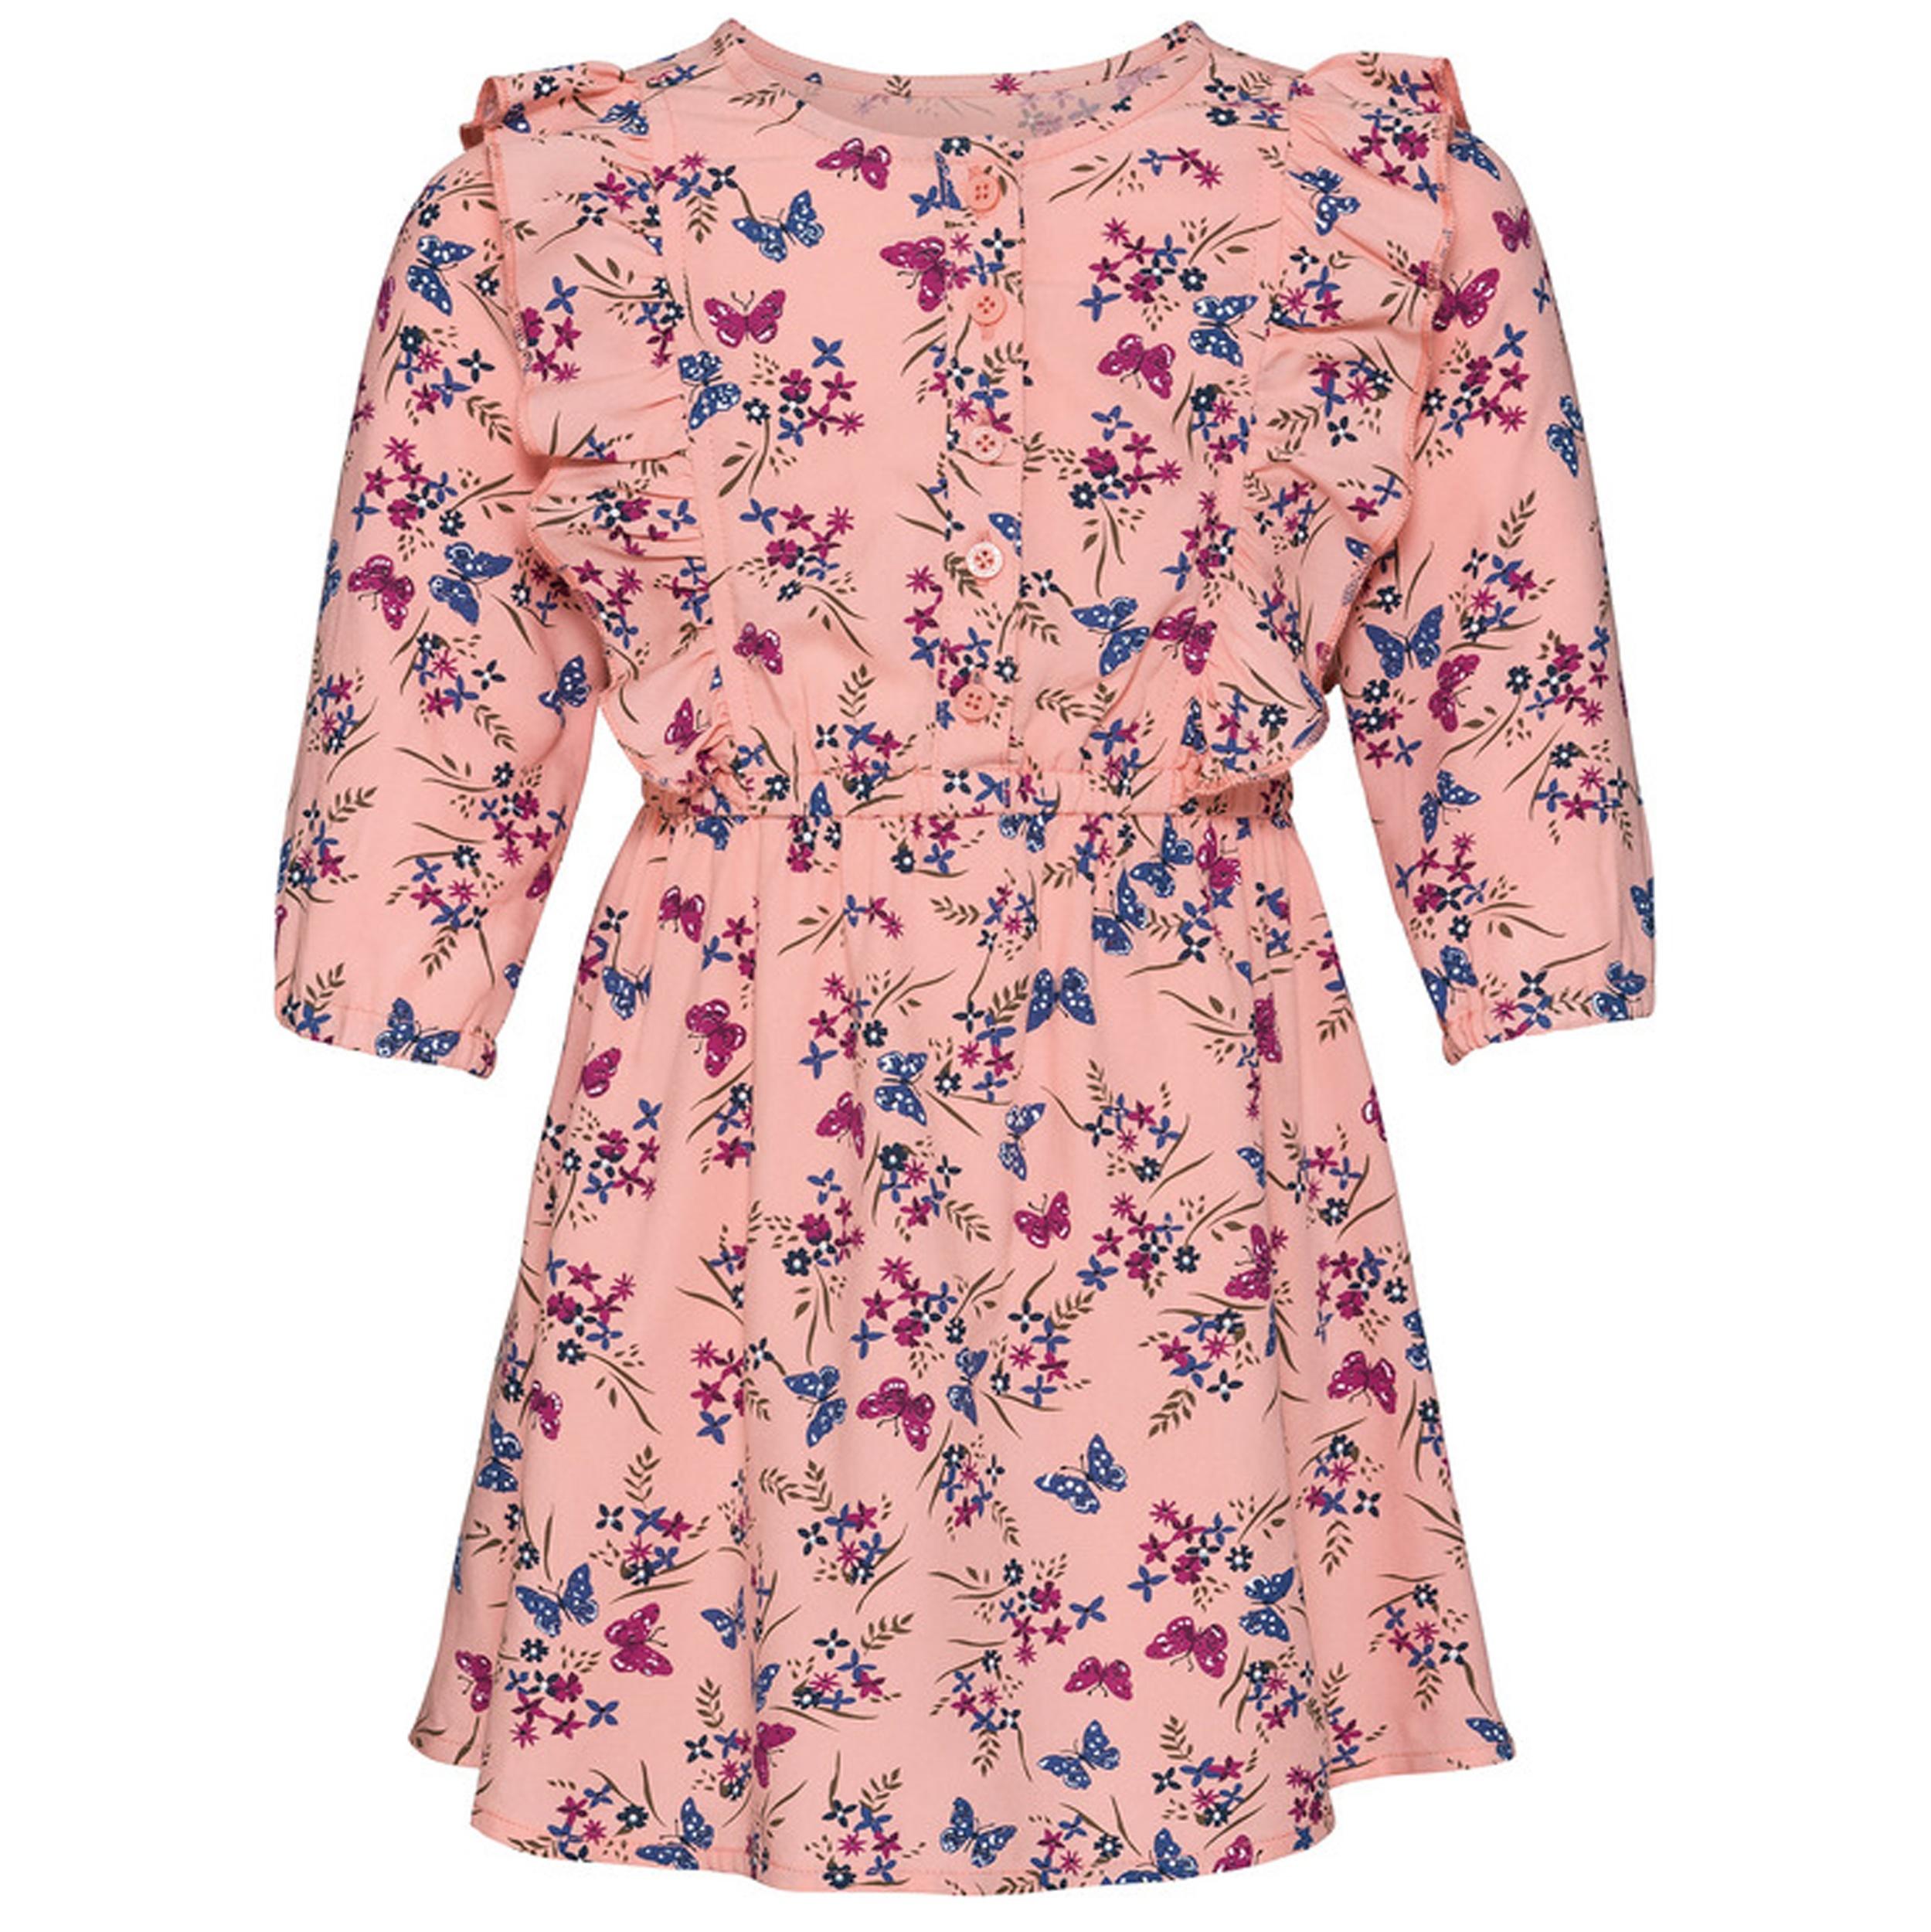 پیراهن دخترانه لوپیلو مدل PHSPIN1